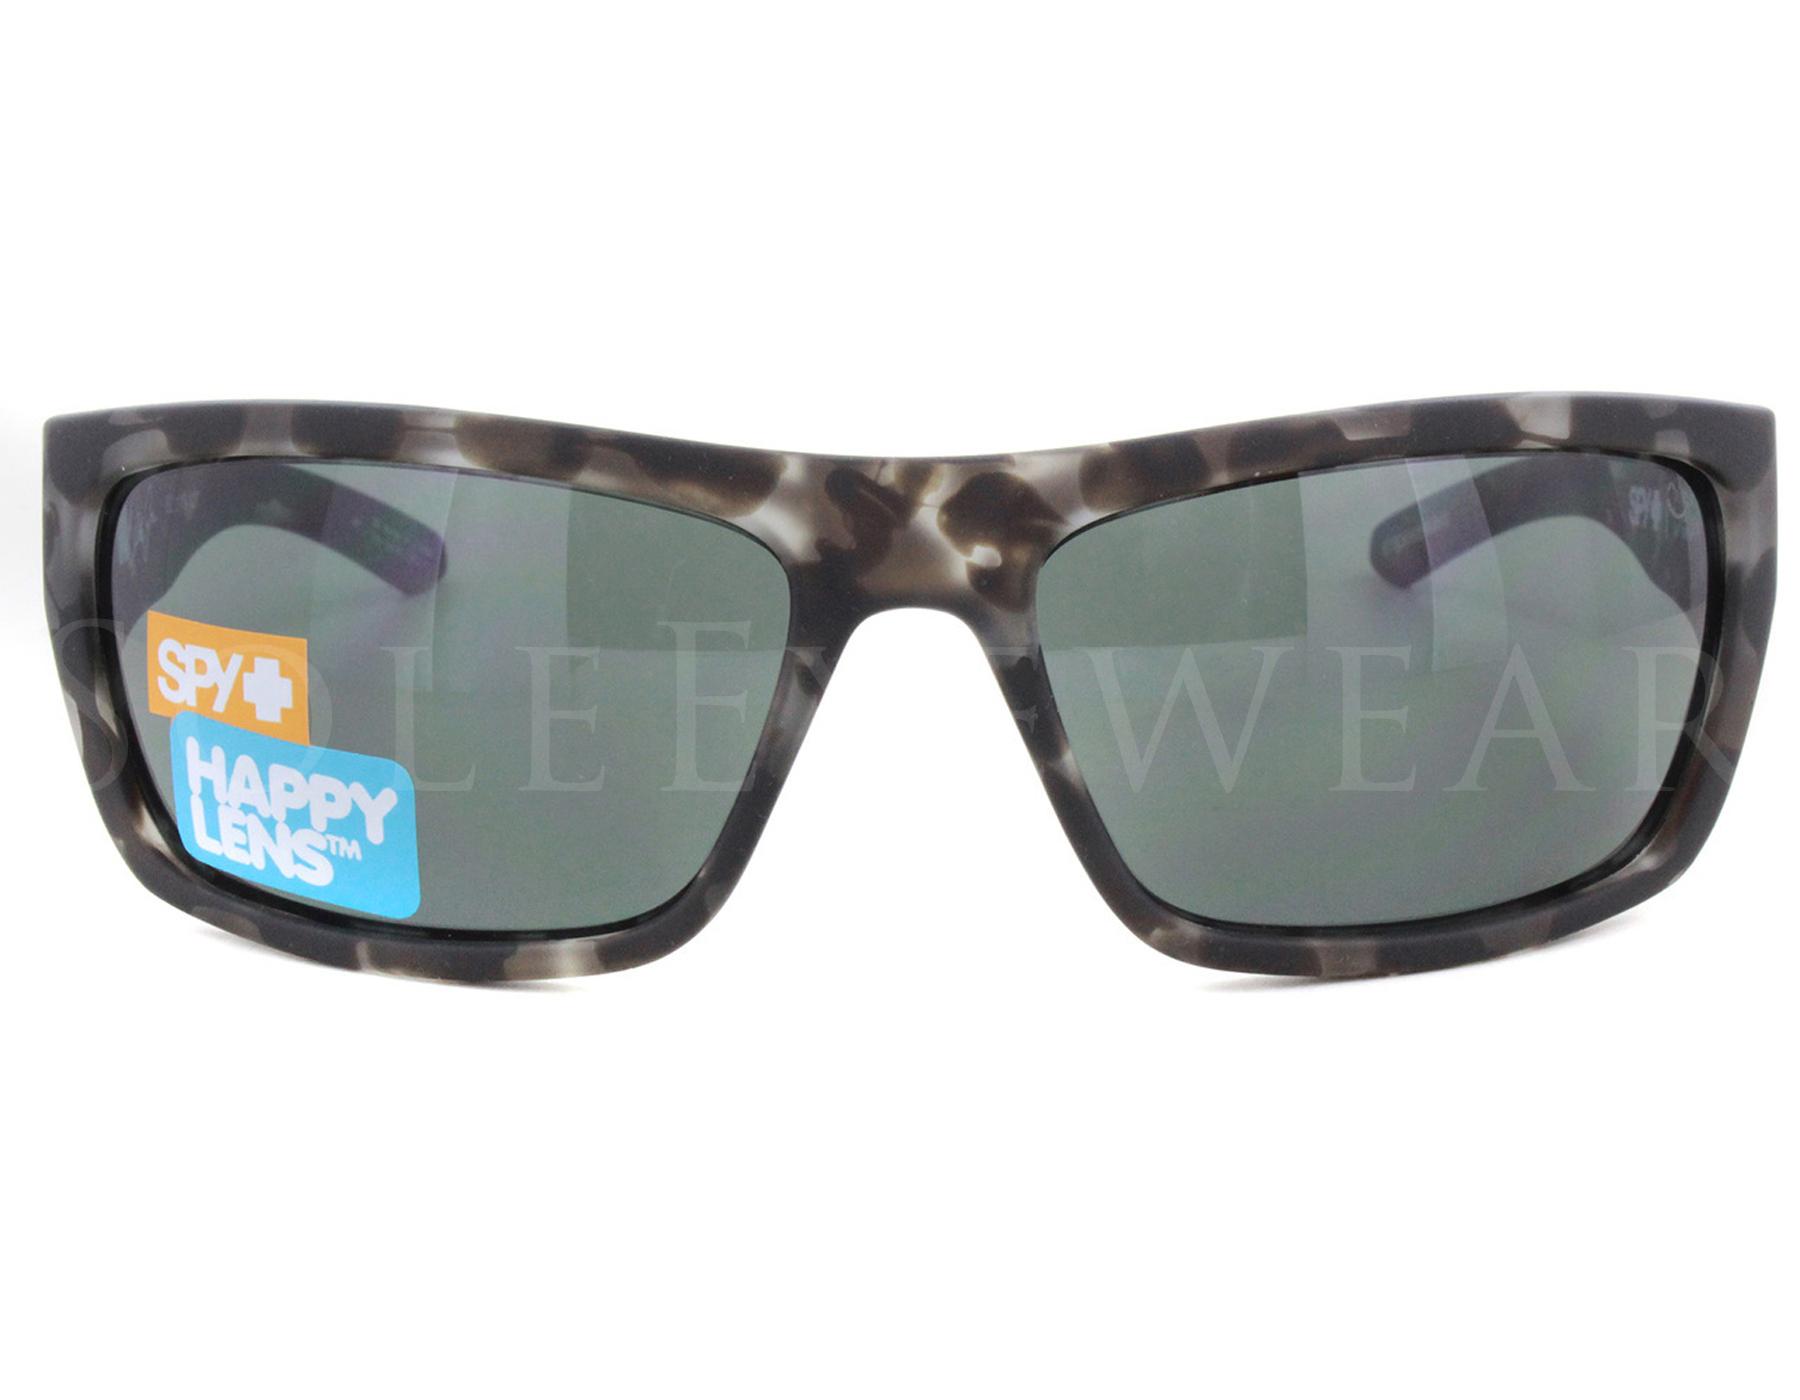 bed41e2164e8 NEW Spy Optics Dega 673368289863 Soft Matte Smoke Tortoise   Hap ...